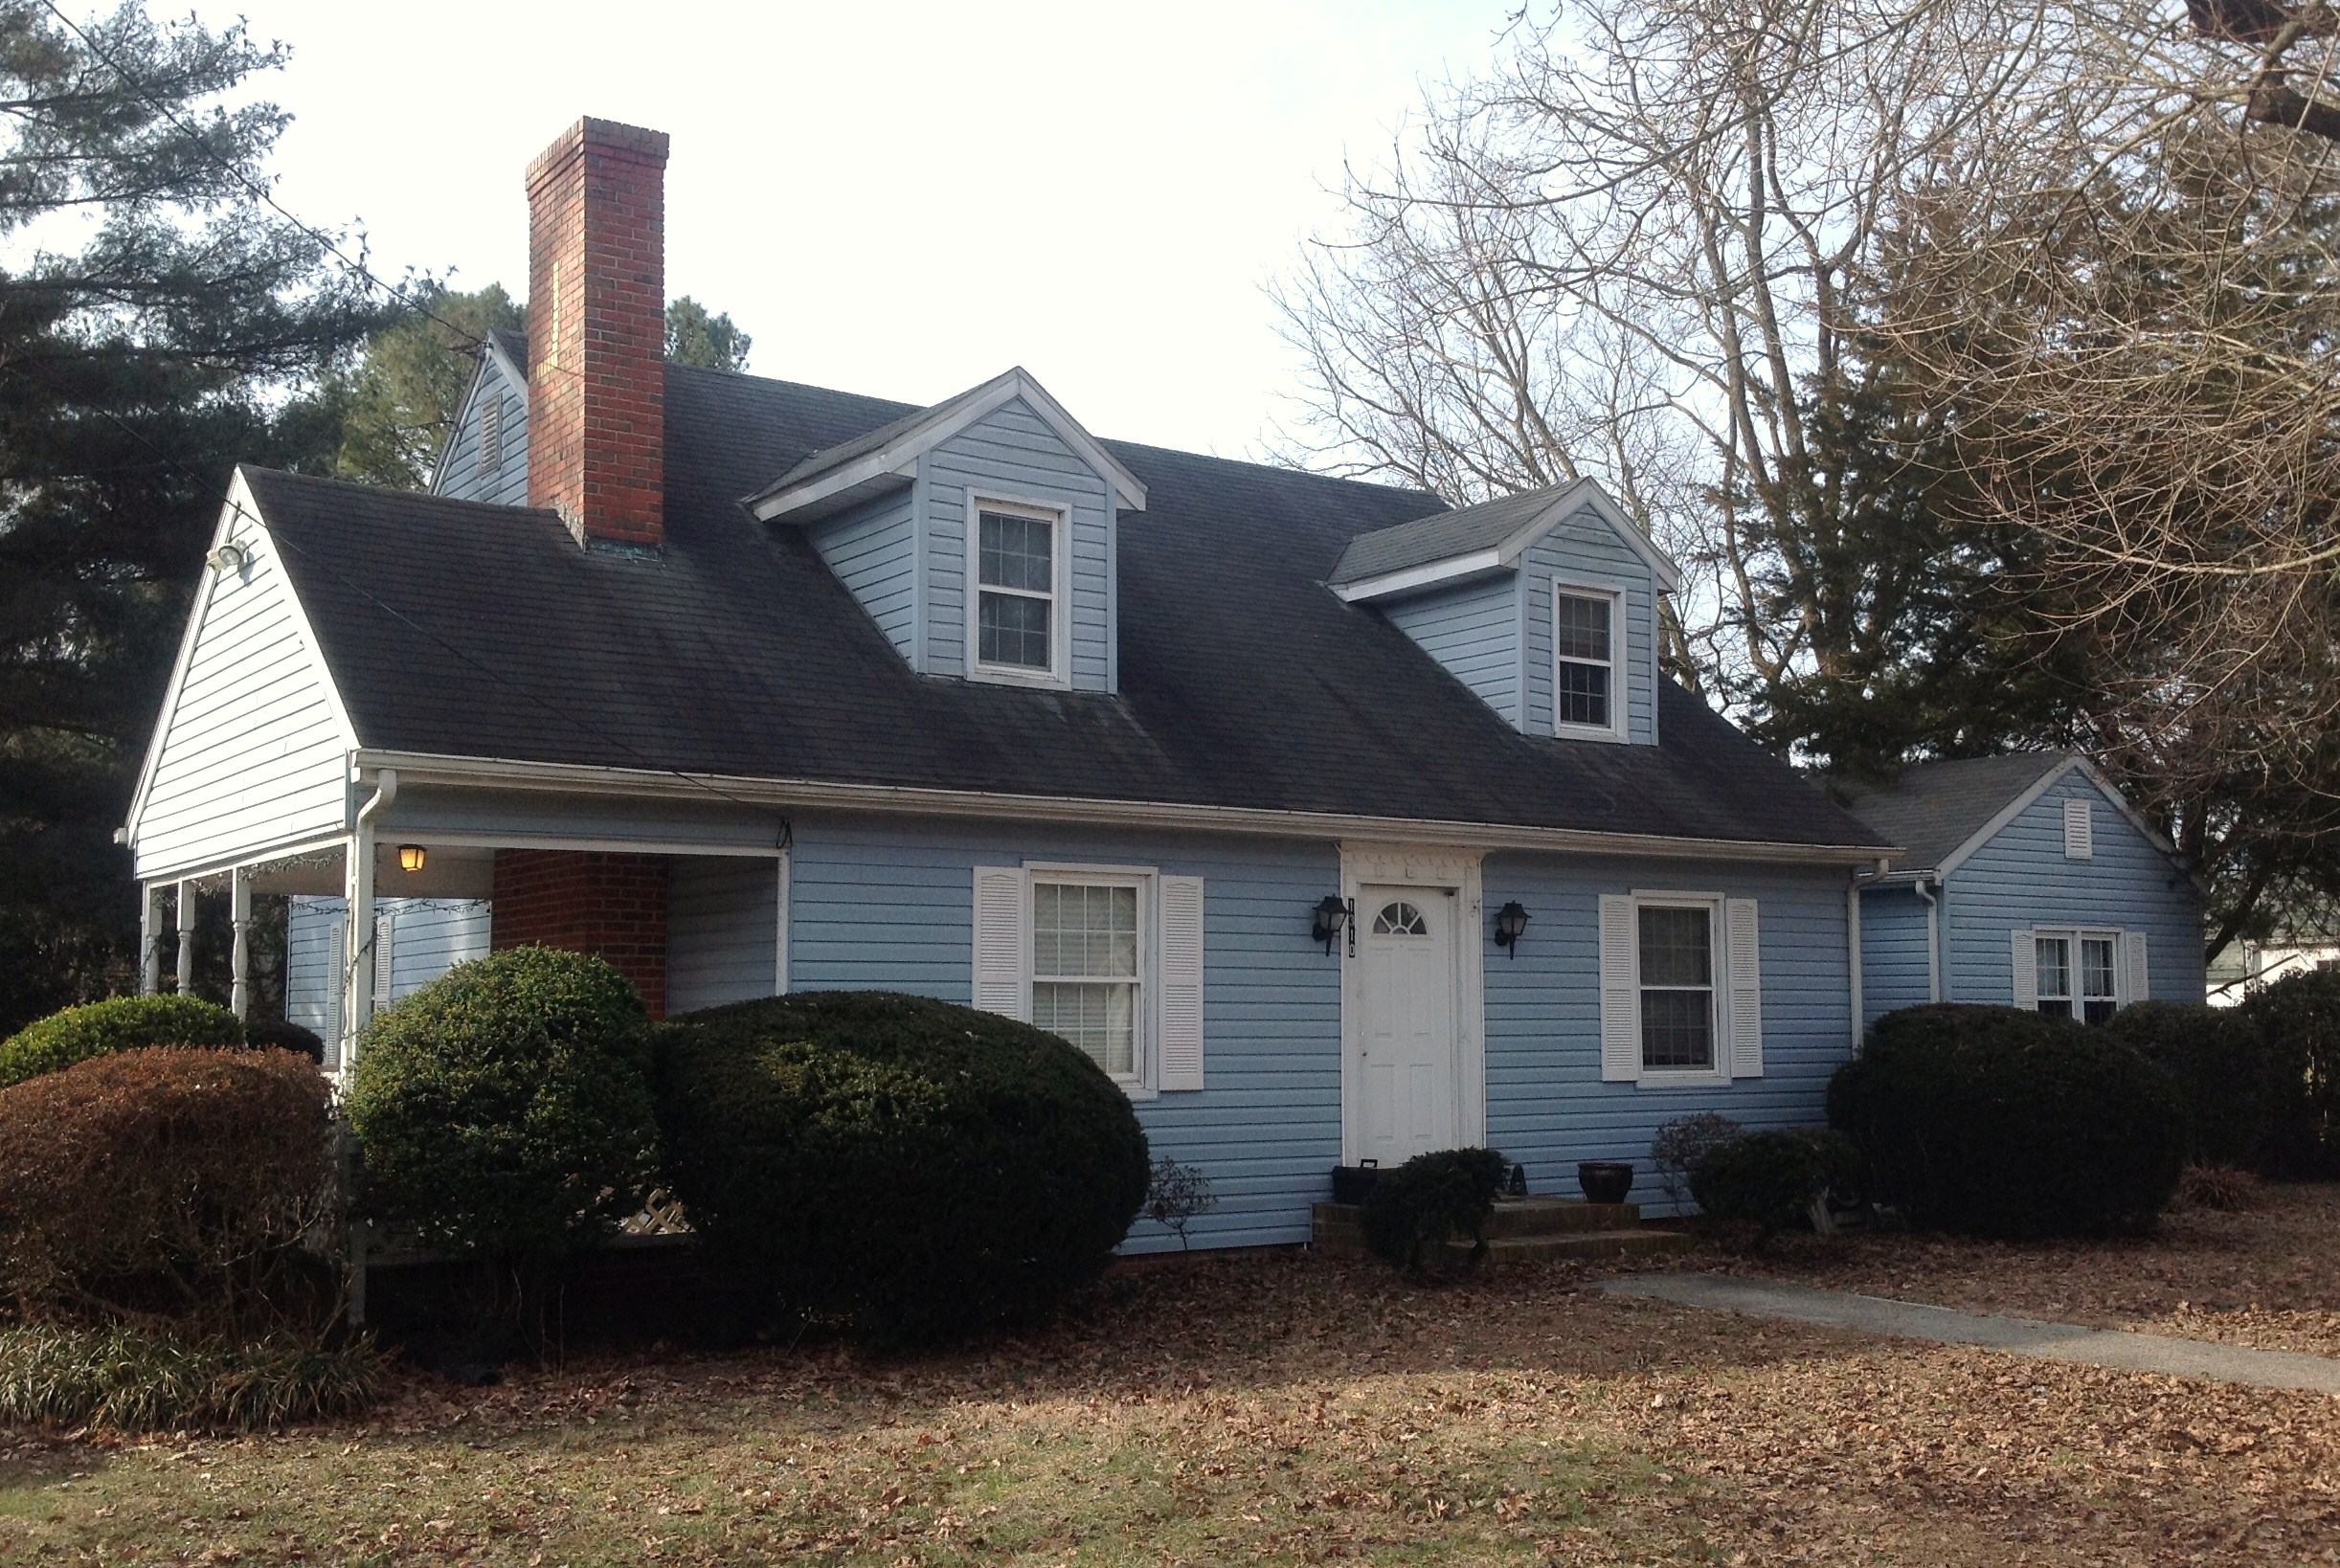 Salisbury MD Real Estate:Sylvia Ave